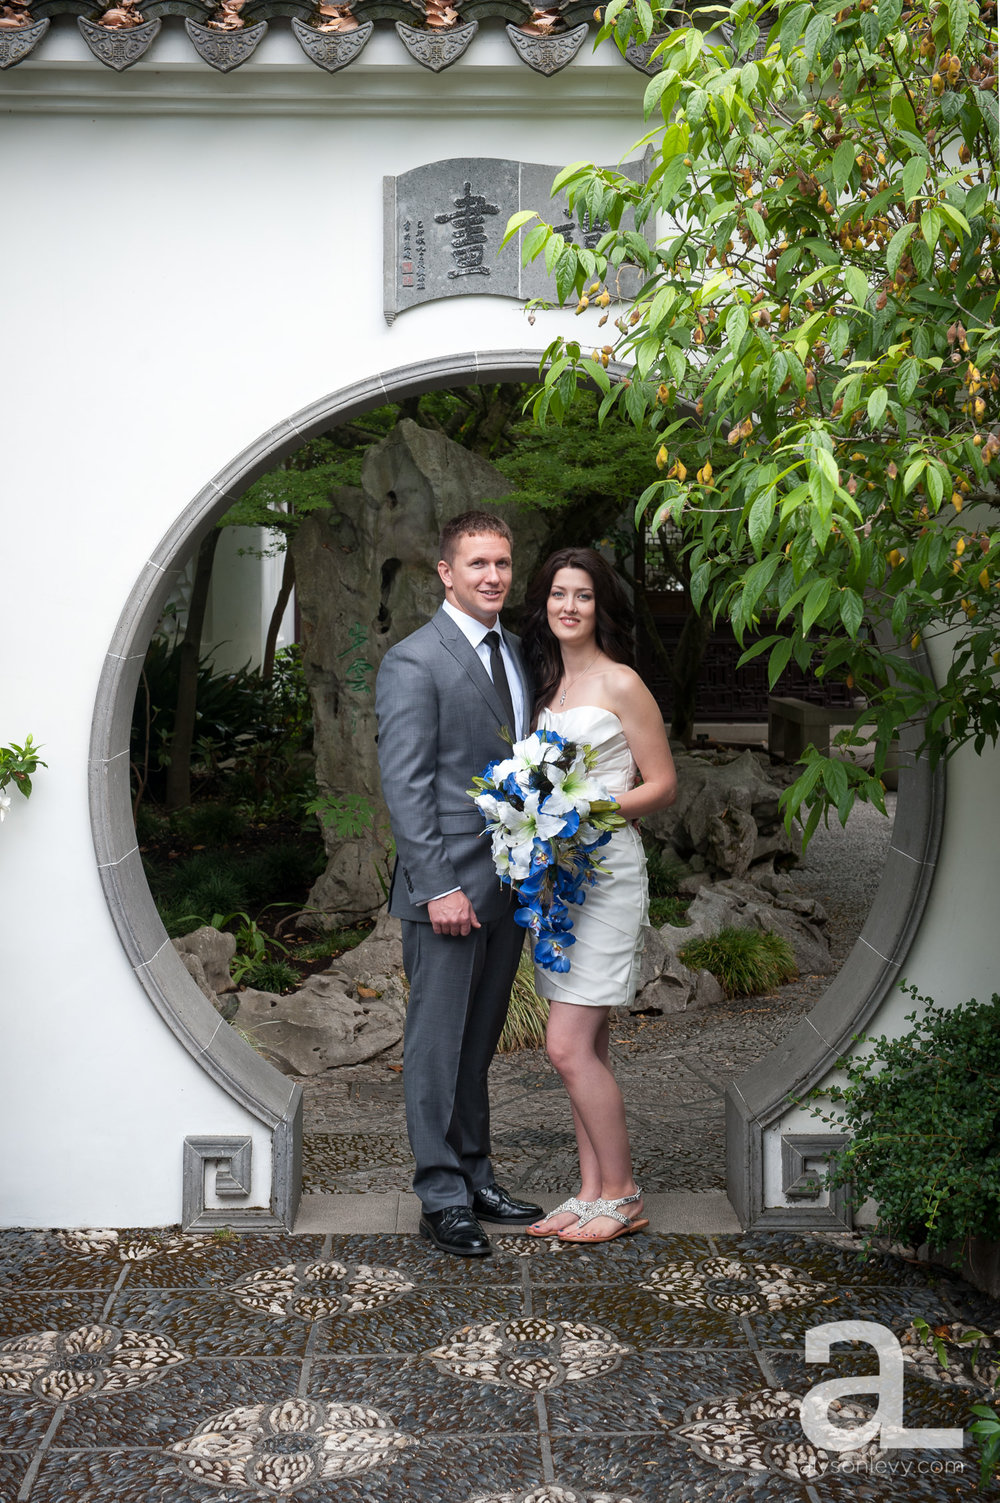 LanSu-Chinese-Garden-Portland-Wedding-Photography-009.jpg